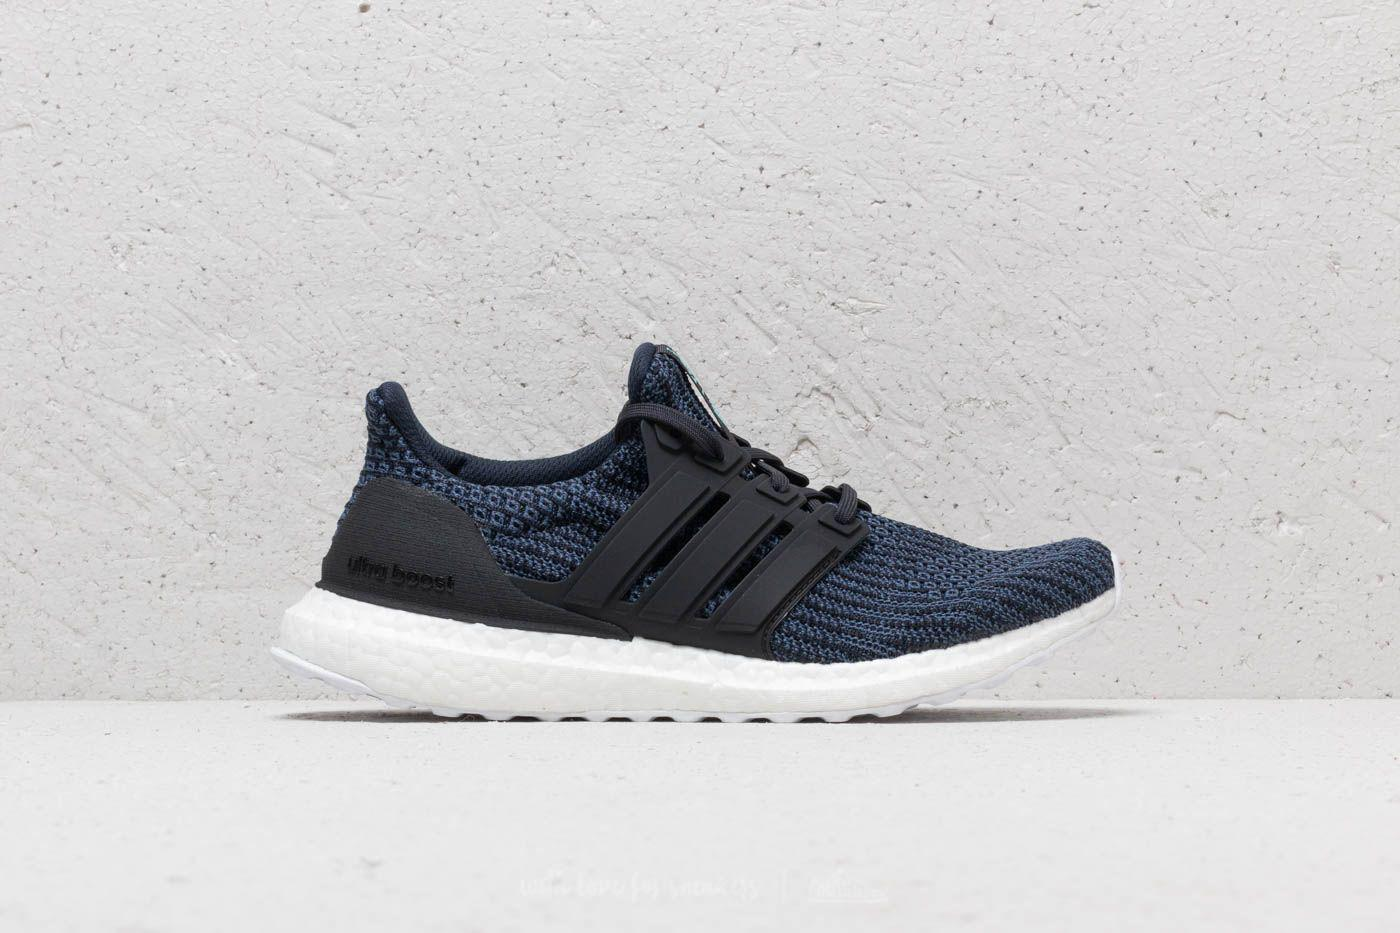 huge selection of 70dfa a561f Lyst - Footshop Adidas Ultraboost W Parley Legend Ink Carbon